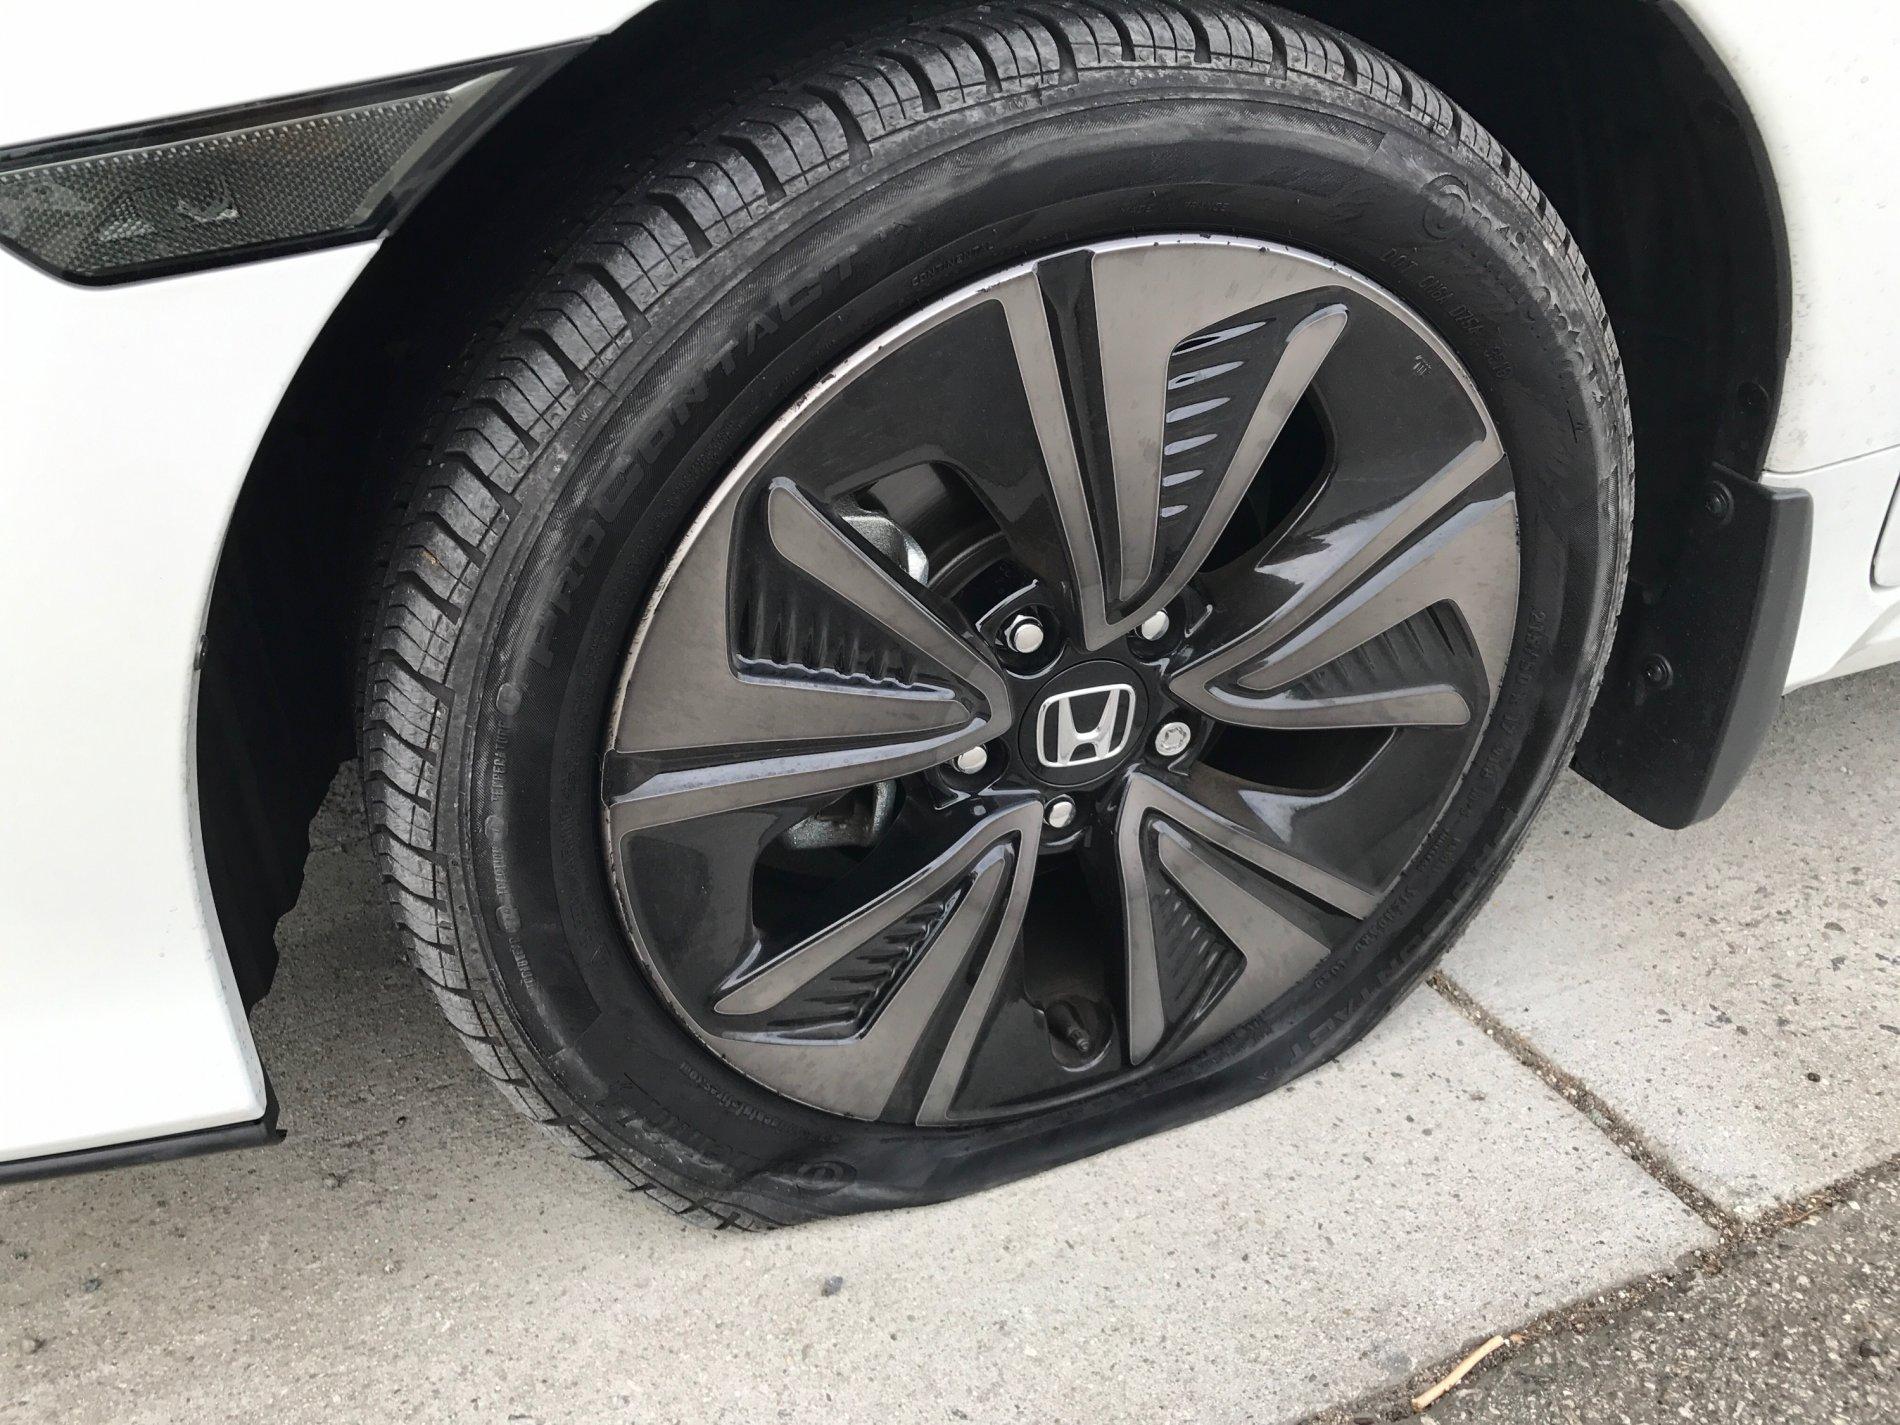 TPMS did not light up before flat tire | 2016+ Honda Civic Forum ...